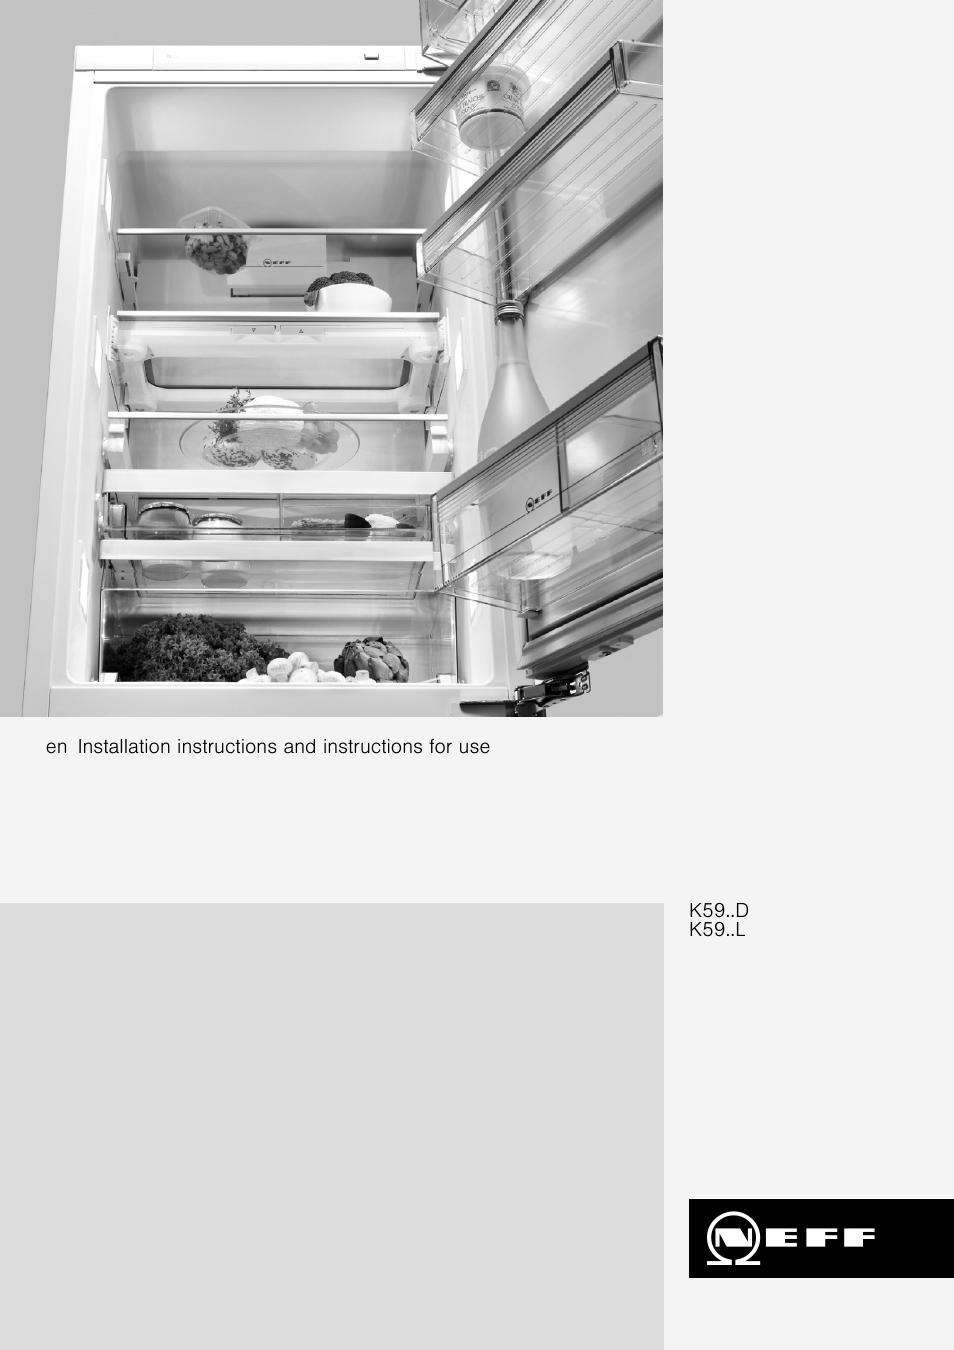 neff k5920l0gb user manual 26 pages rh manualsdir com Whirlpool Dishwasher Manual Repair Manuals